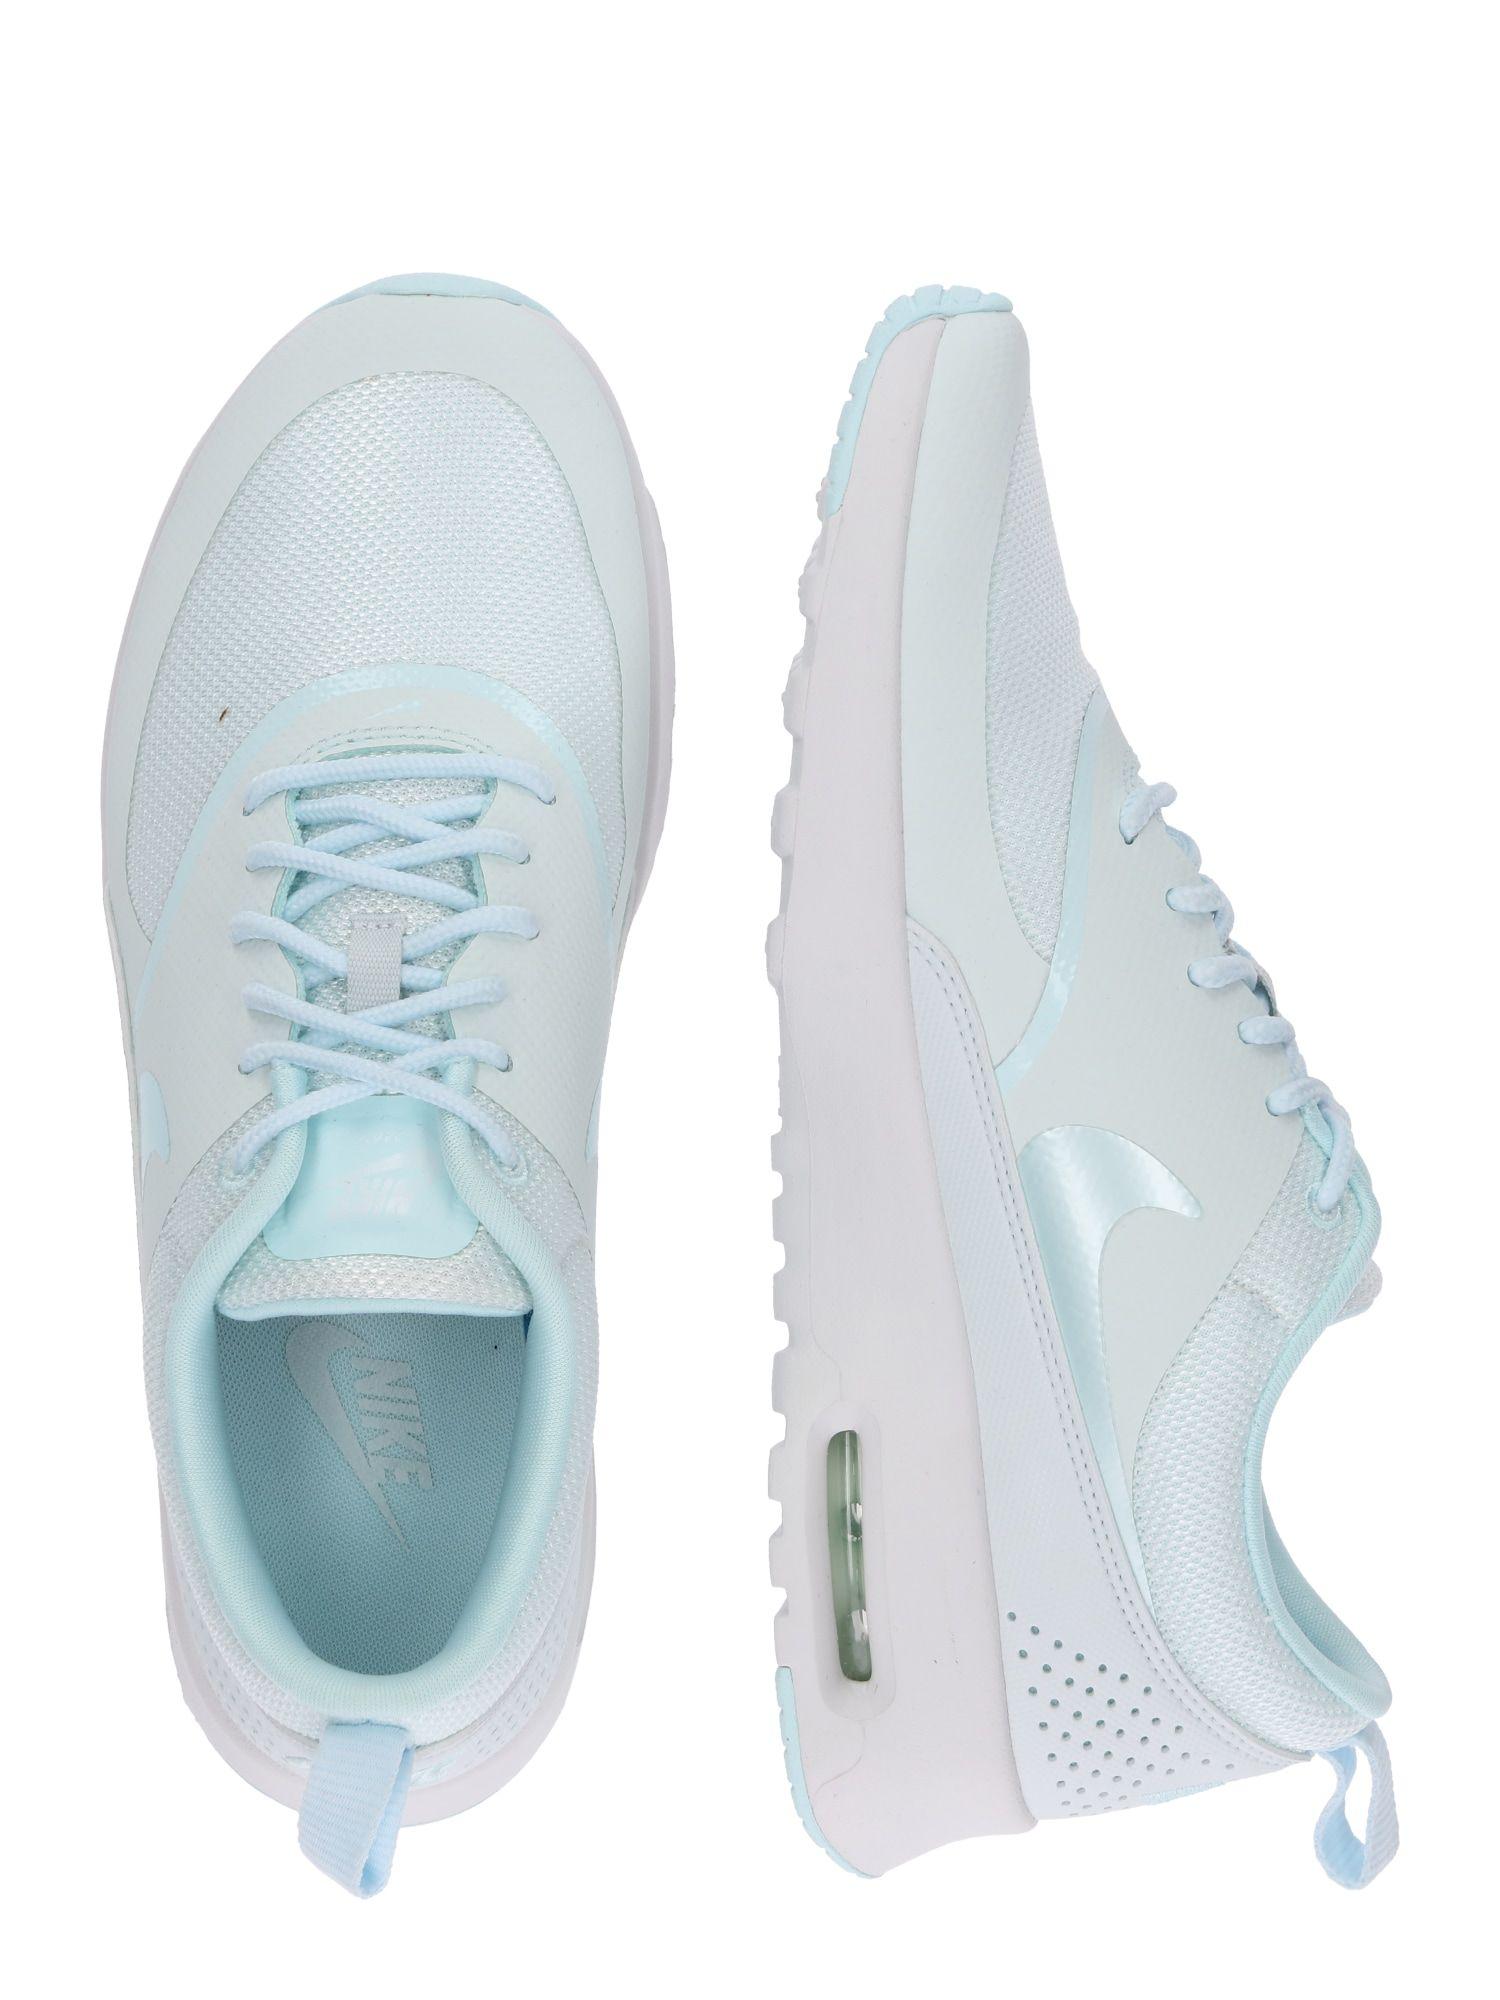 Nike Sportswear Sneaker 'Air Max Thea' Damen, Aqua Weiß